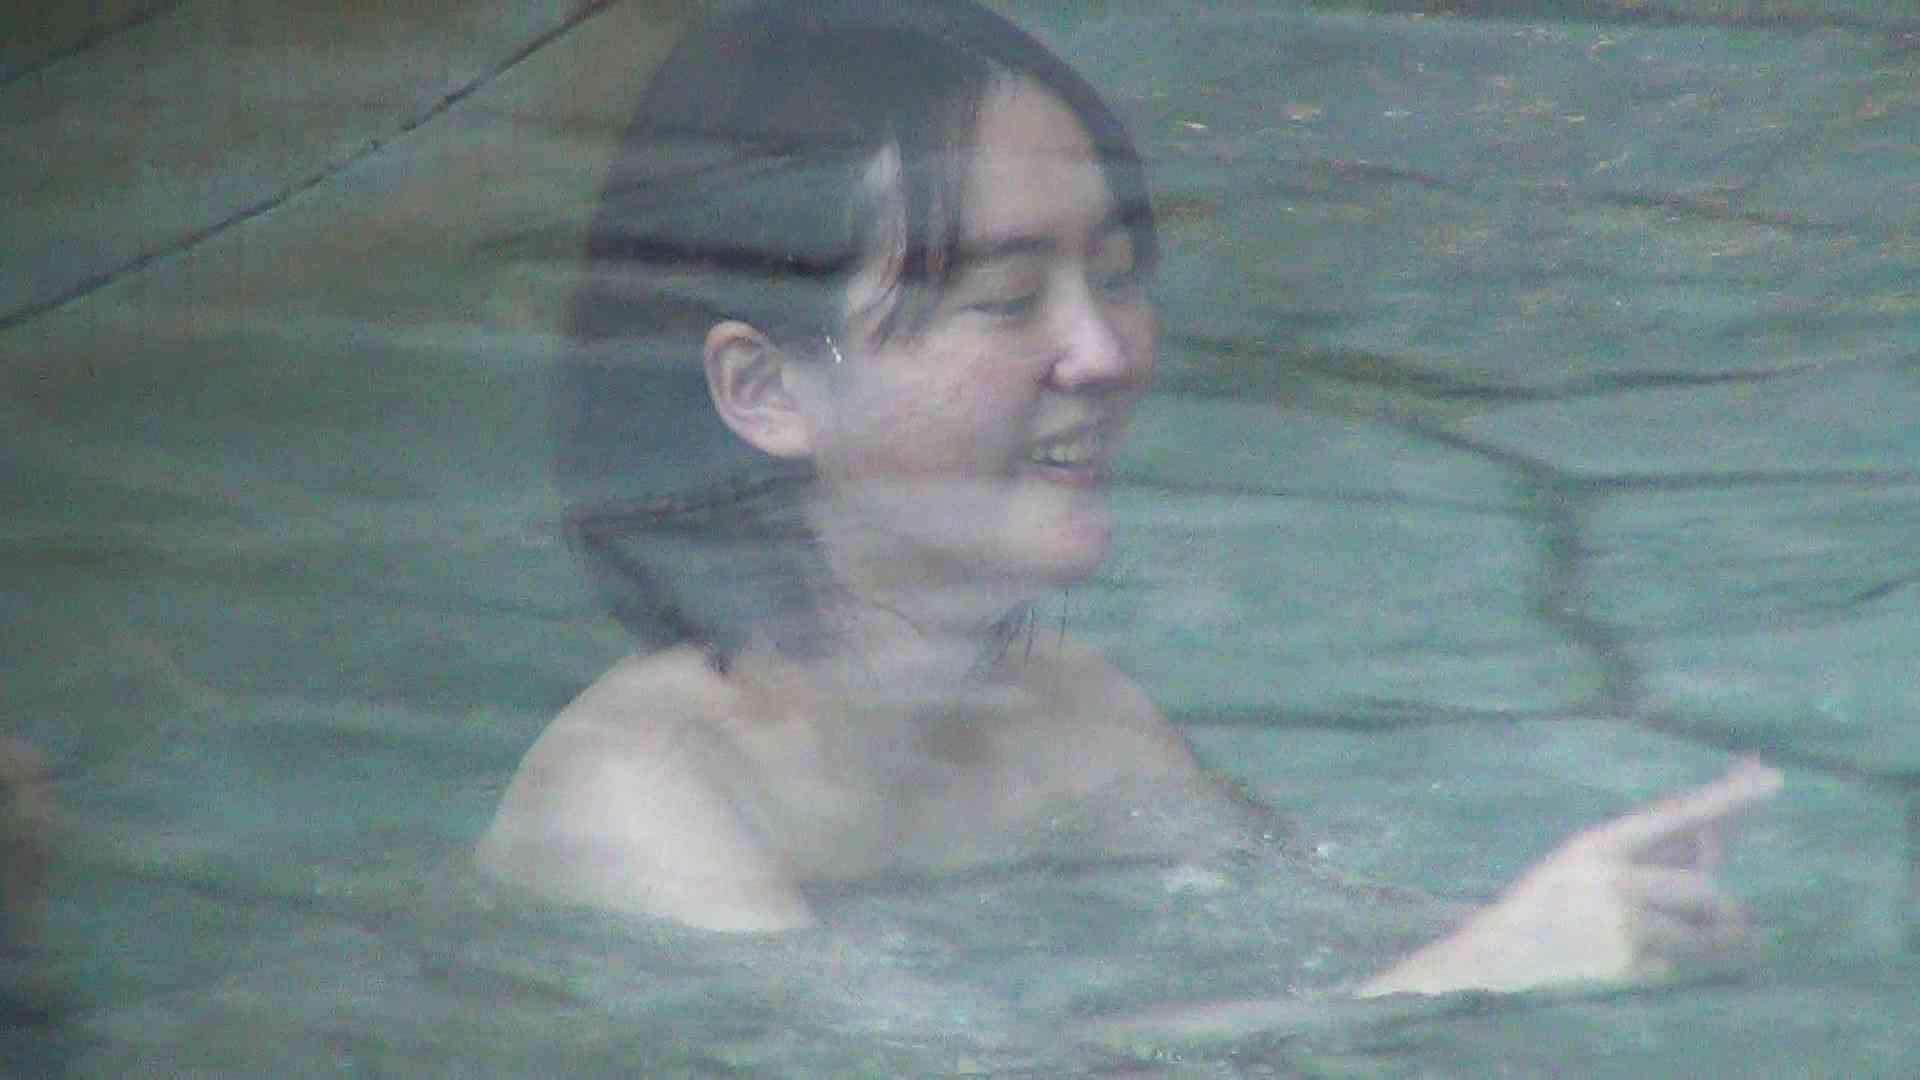 Aquaな露天風呂Vol.297 女体盗撮   OL女体  91連発 82